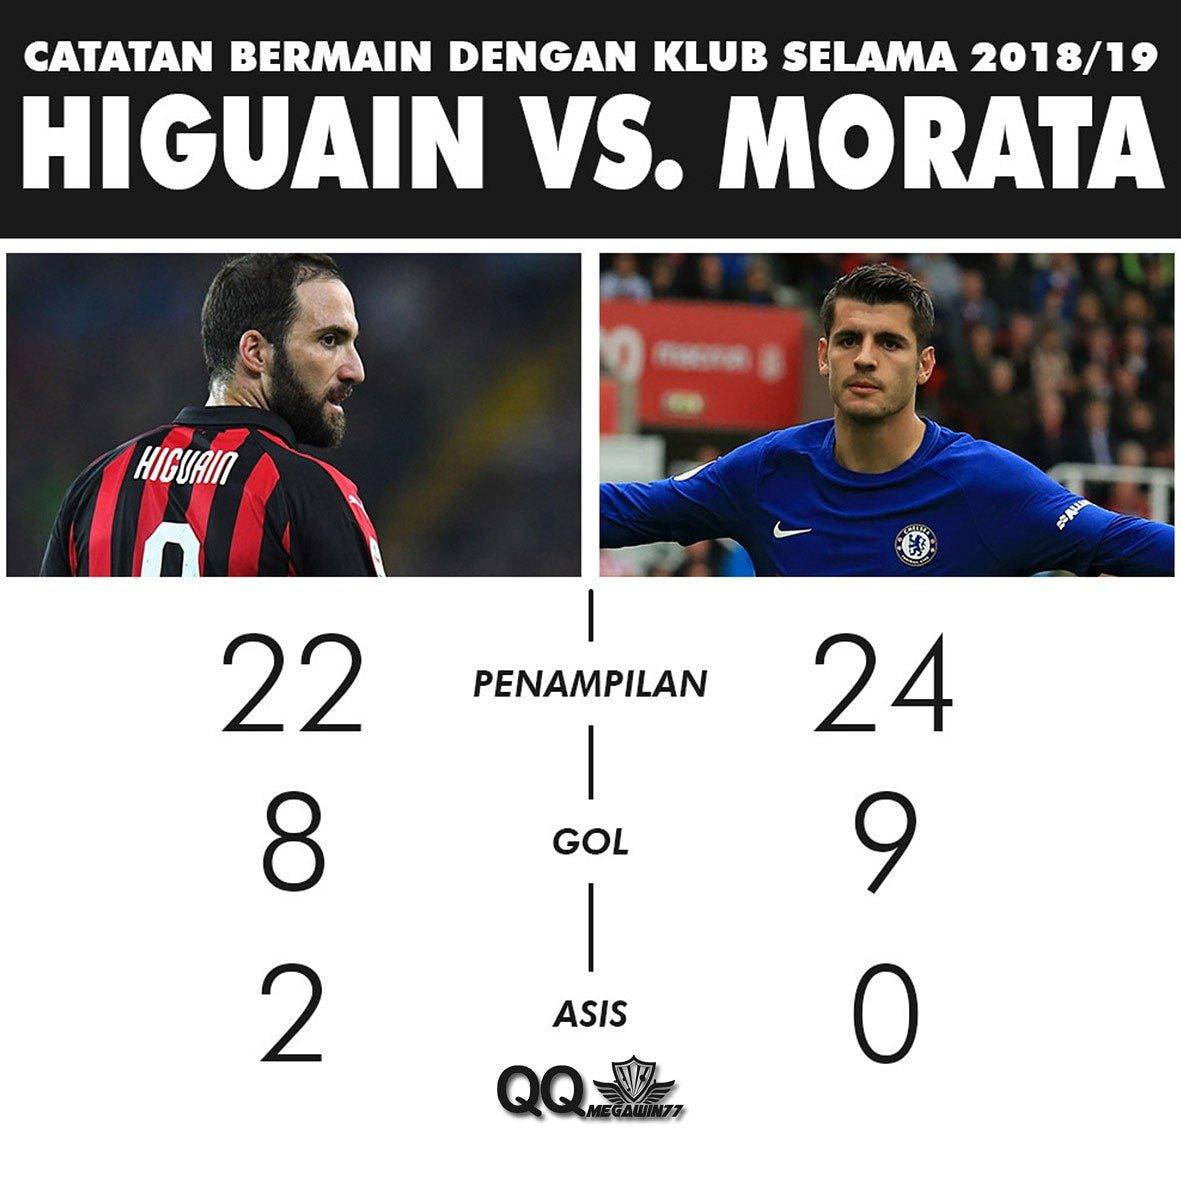 #Chelsea yang semakin gencar ingin mendapatkan #Higuain akan membuka jalan bagi #Morata untuk bergabung kembali dengan #AtleticoMadrid 😌  #qq #megawin #qqmegawin77 #infobola #transferwindow #transfer #transfernews #beritabola #agenbola #judibola #judionline #sepakbola